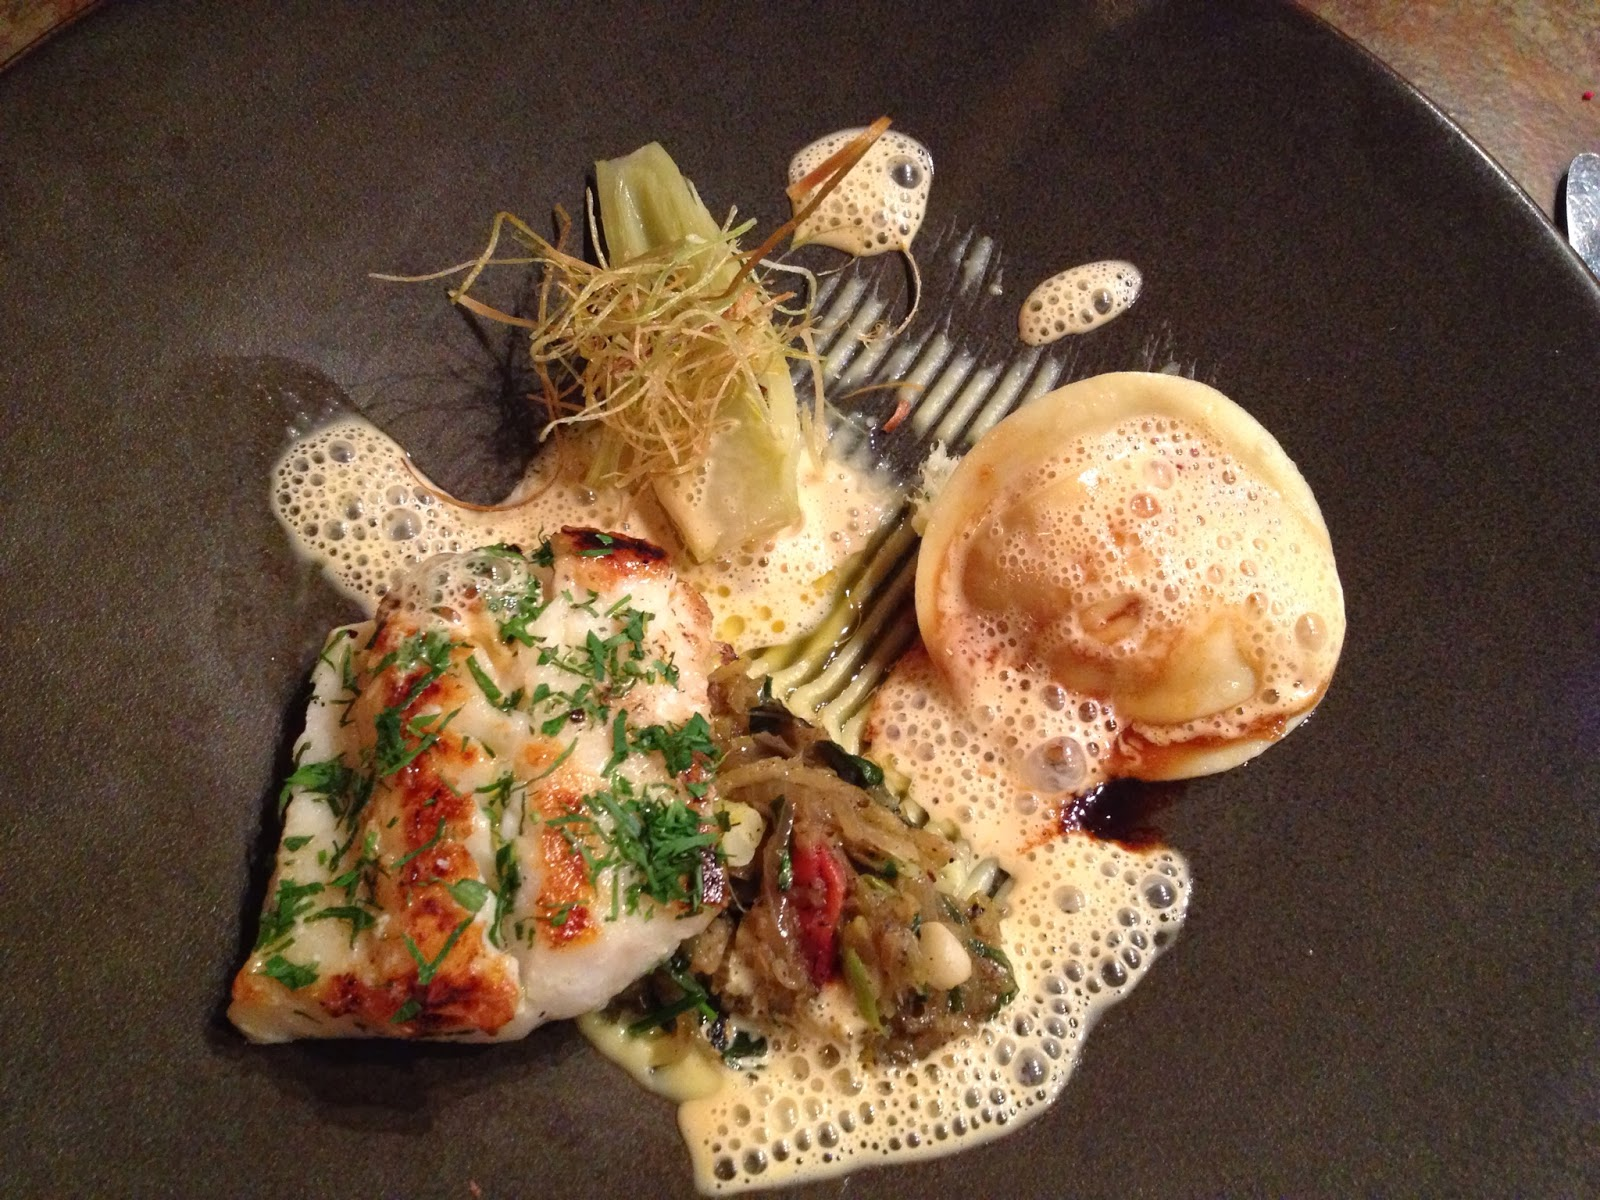 Cape Town - Pan fried line fish